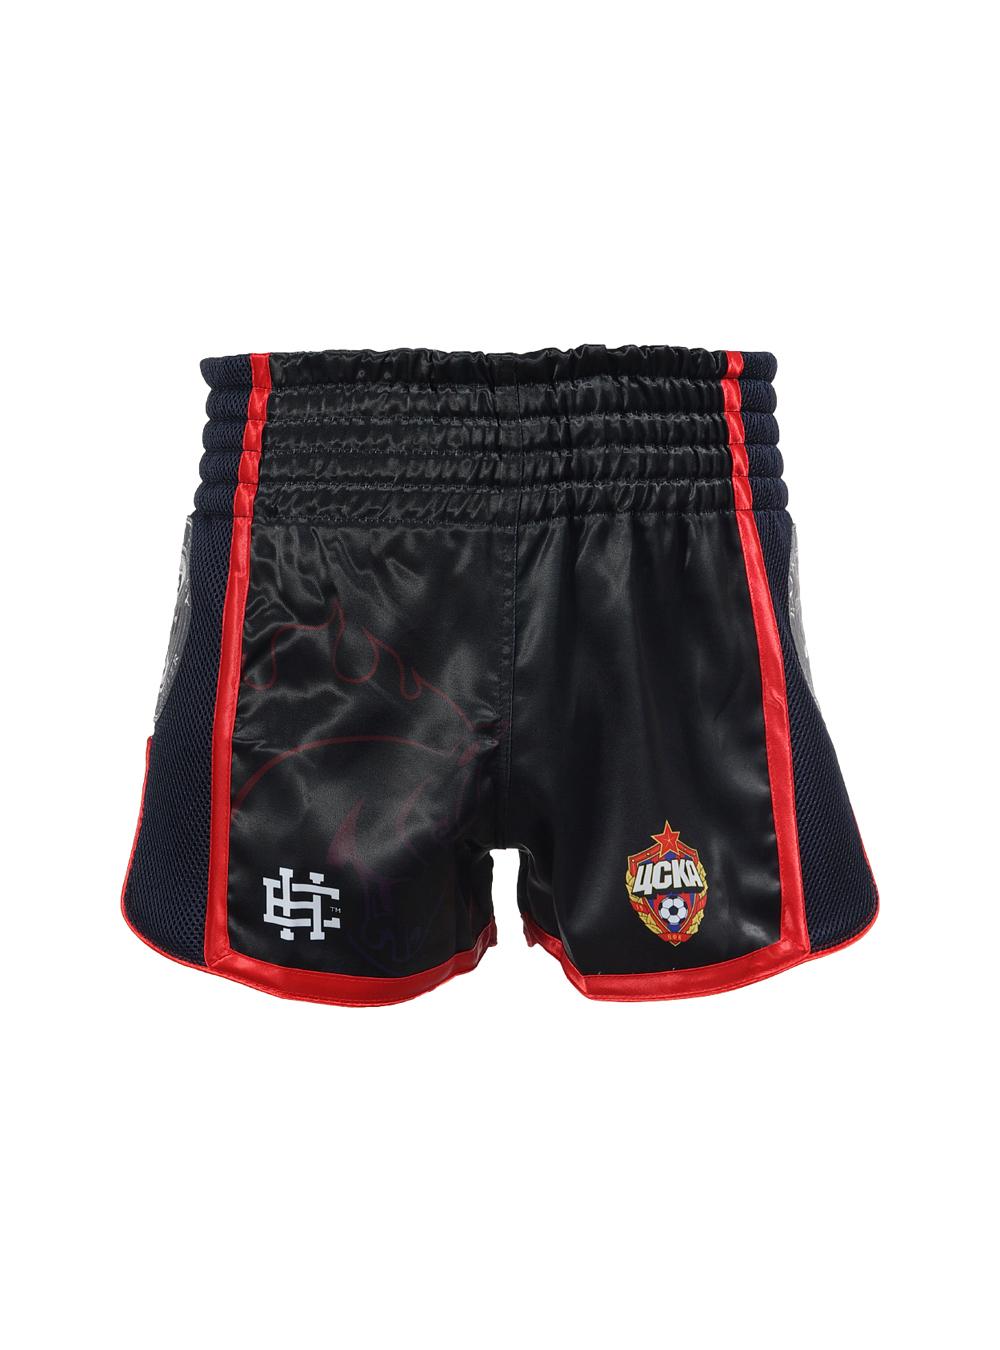 Шорты Muay Thai CSKA (M)Одежда для спорта<br>Шорты Muay Thai CSKA<br>